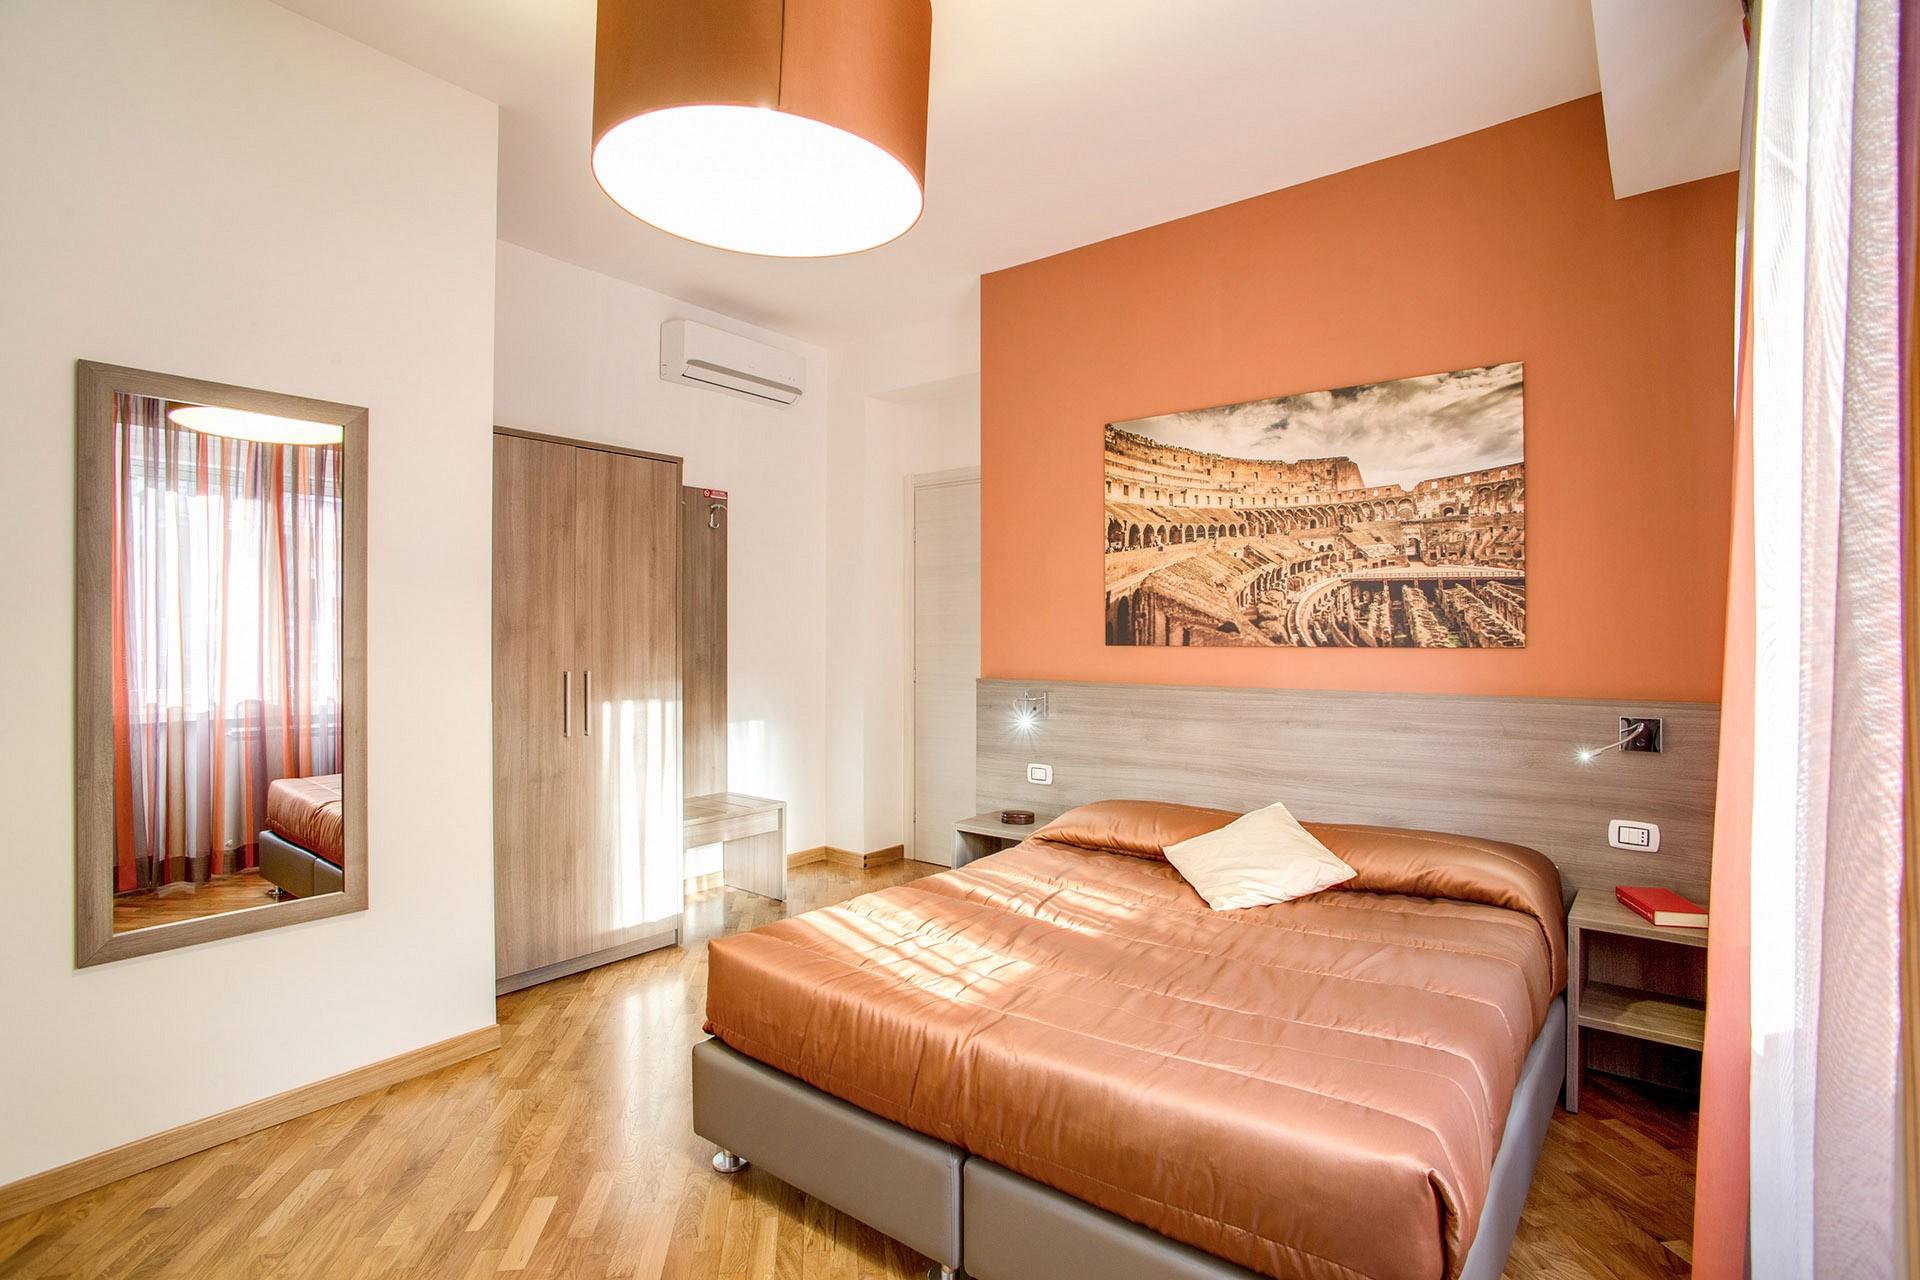 VaticanRoomsCipro   Your room in Rome